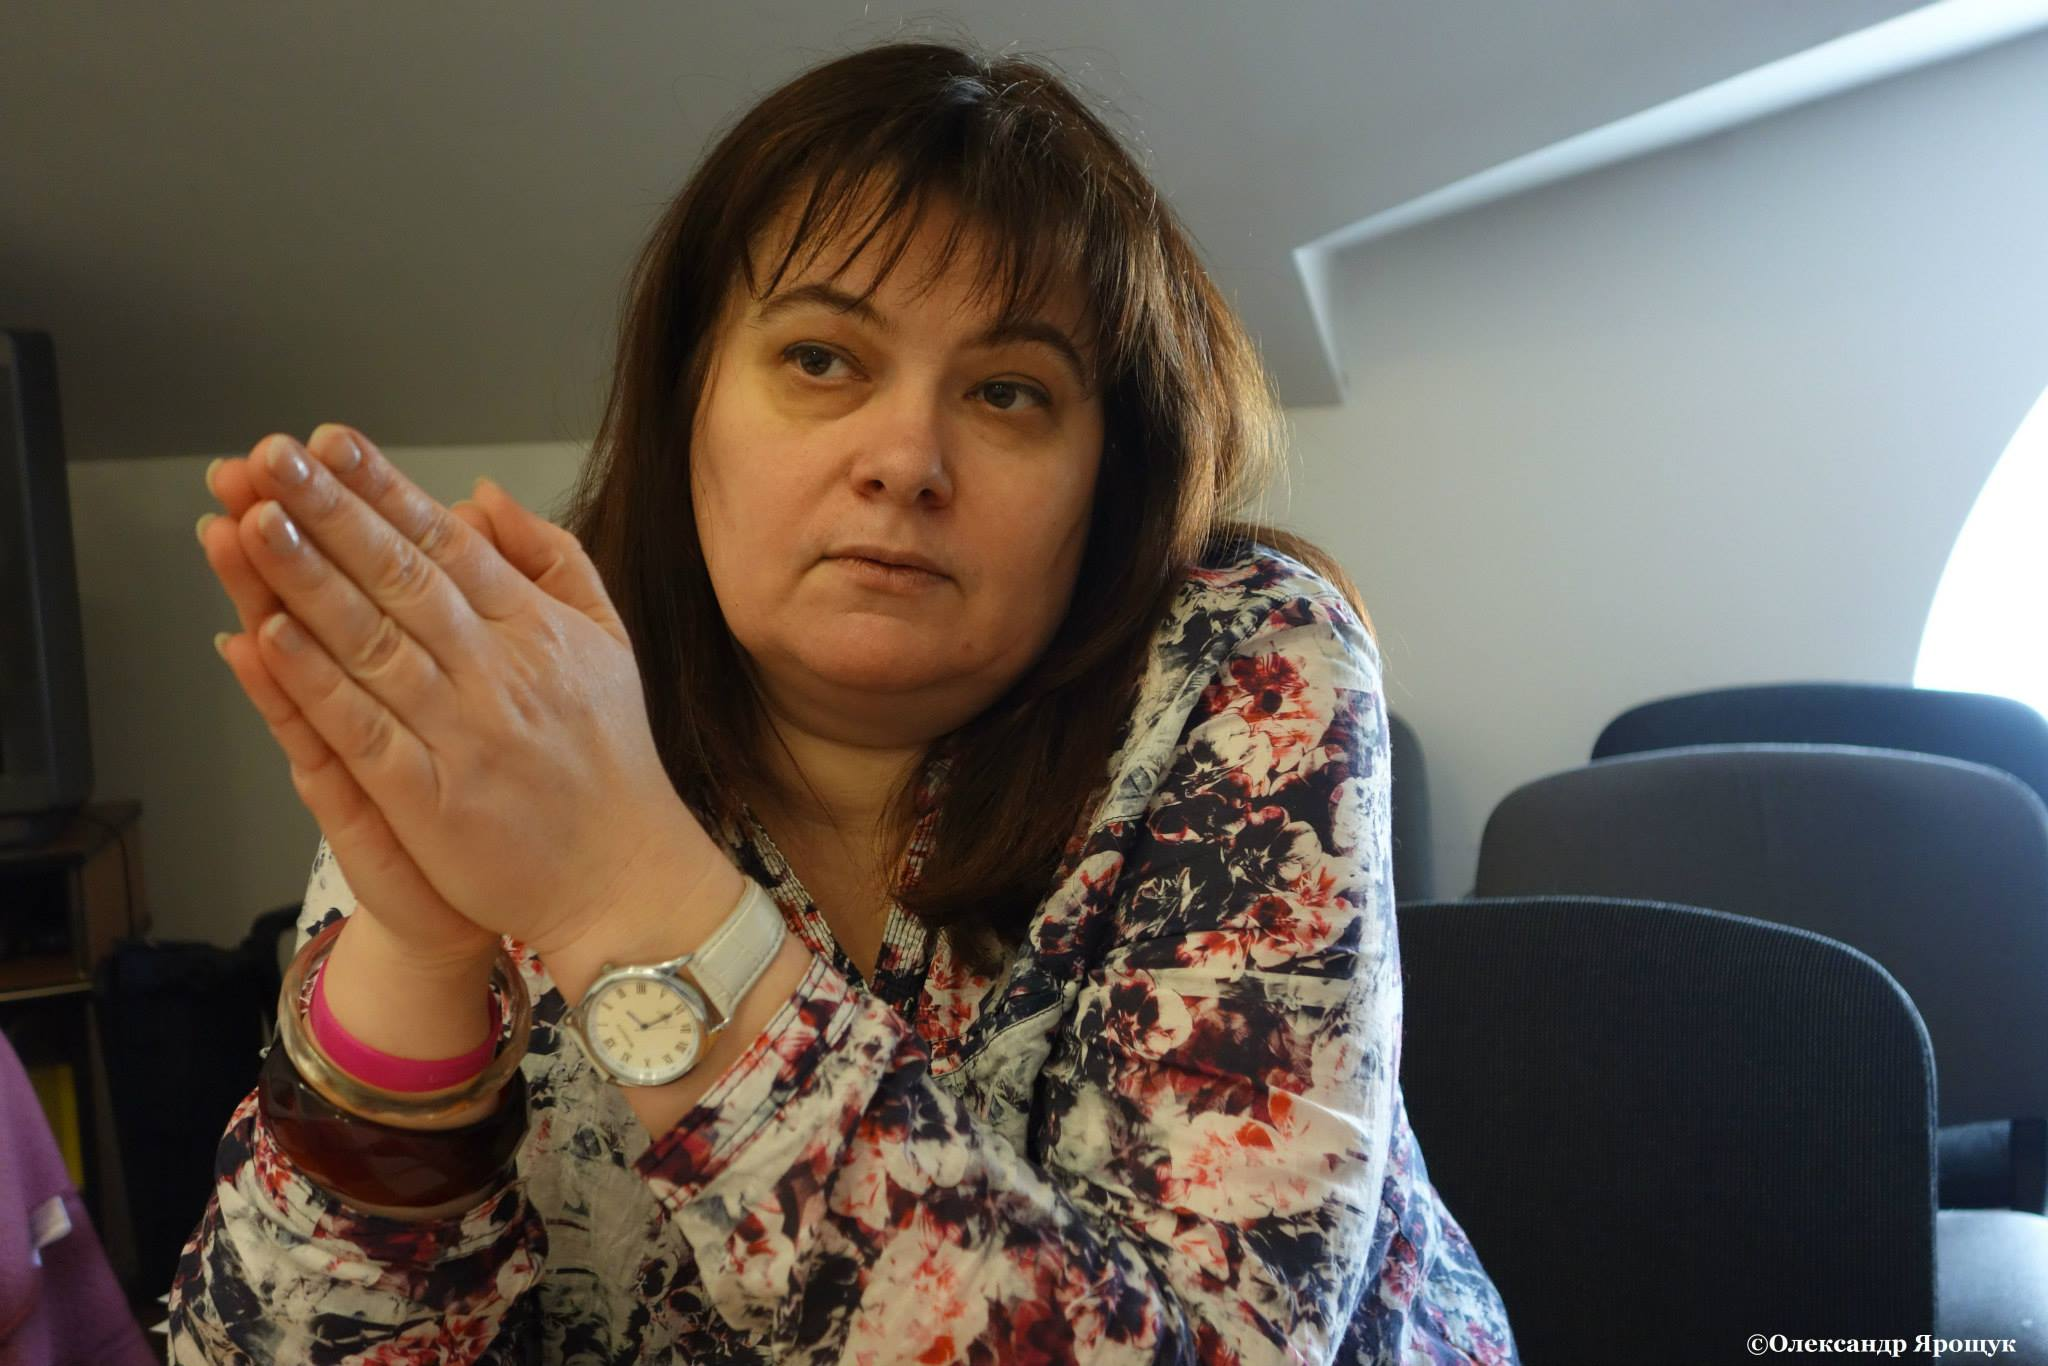 Марта Чумало оглядачка від України в European Women's Lobby